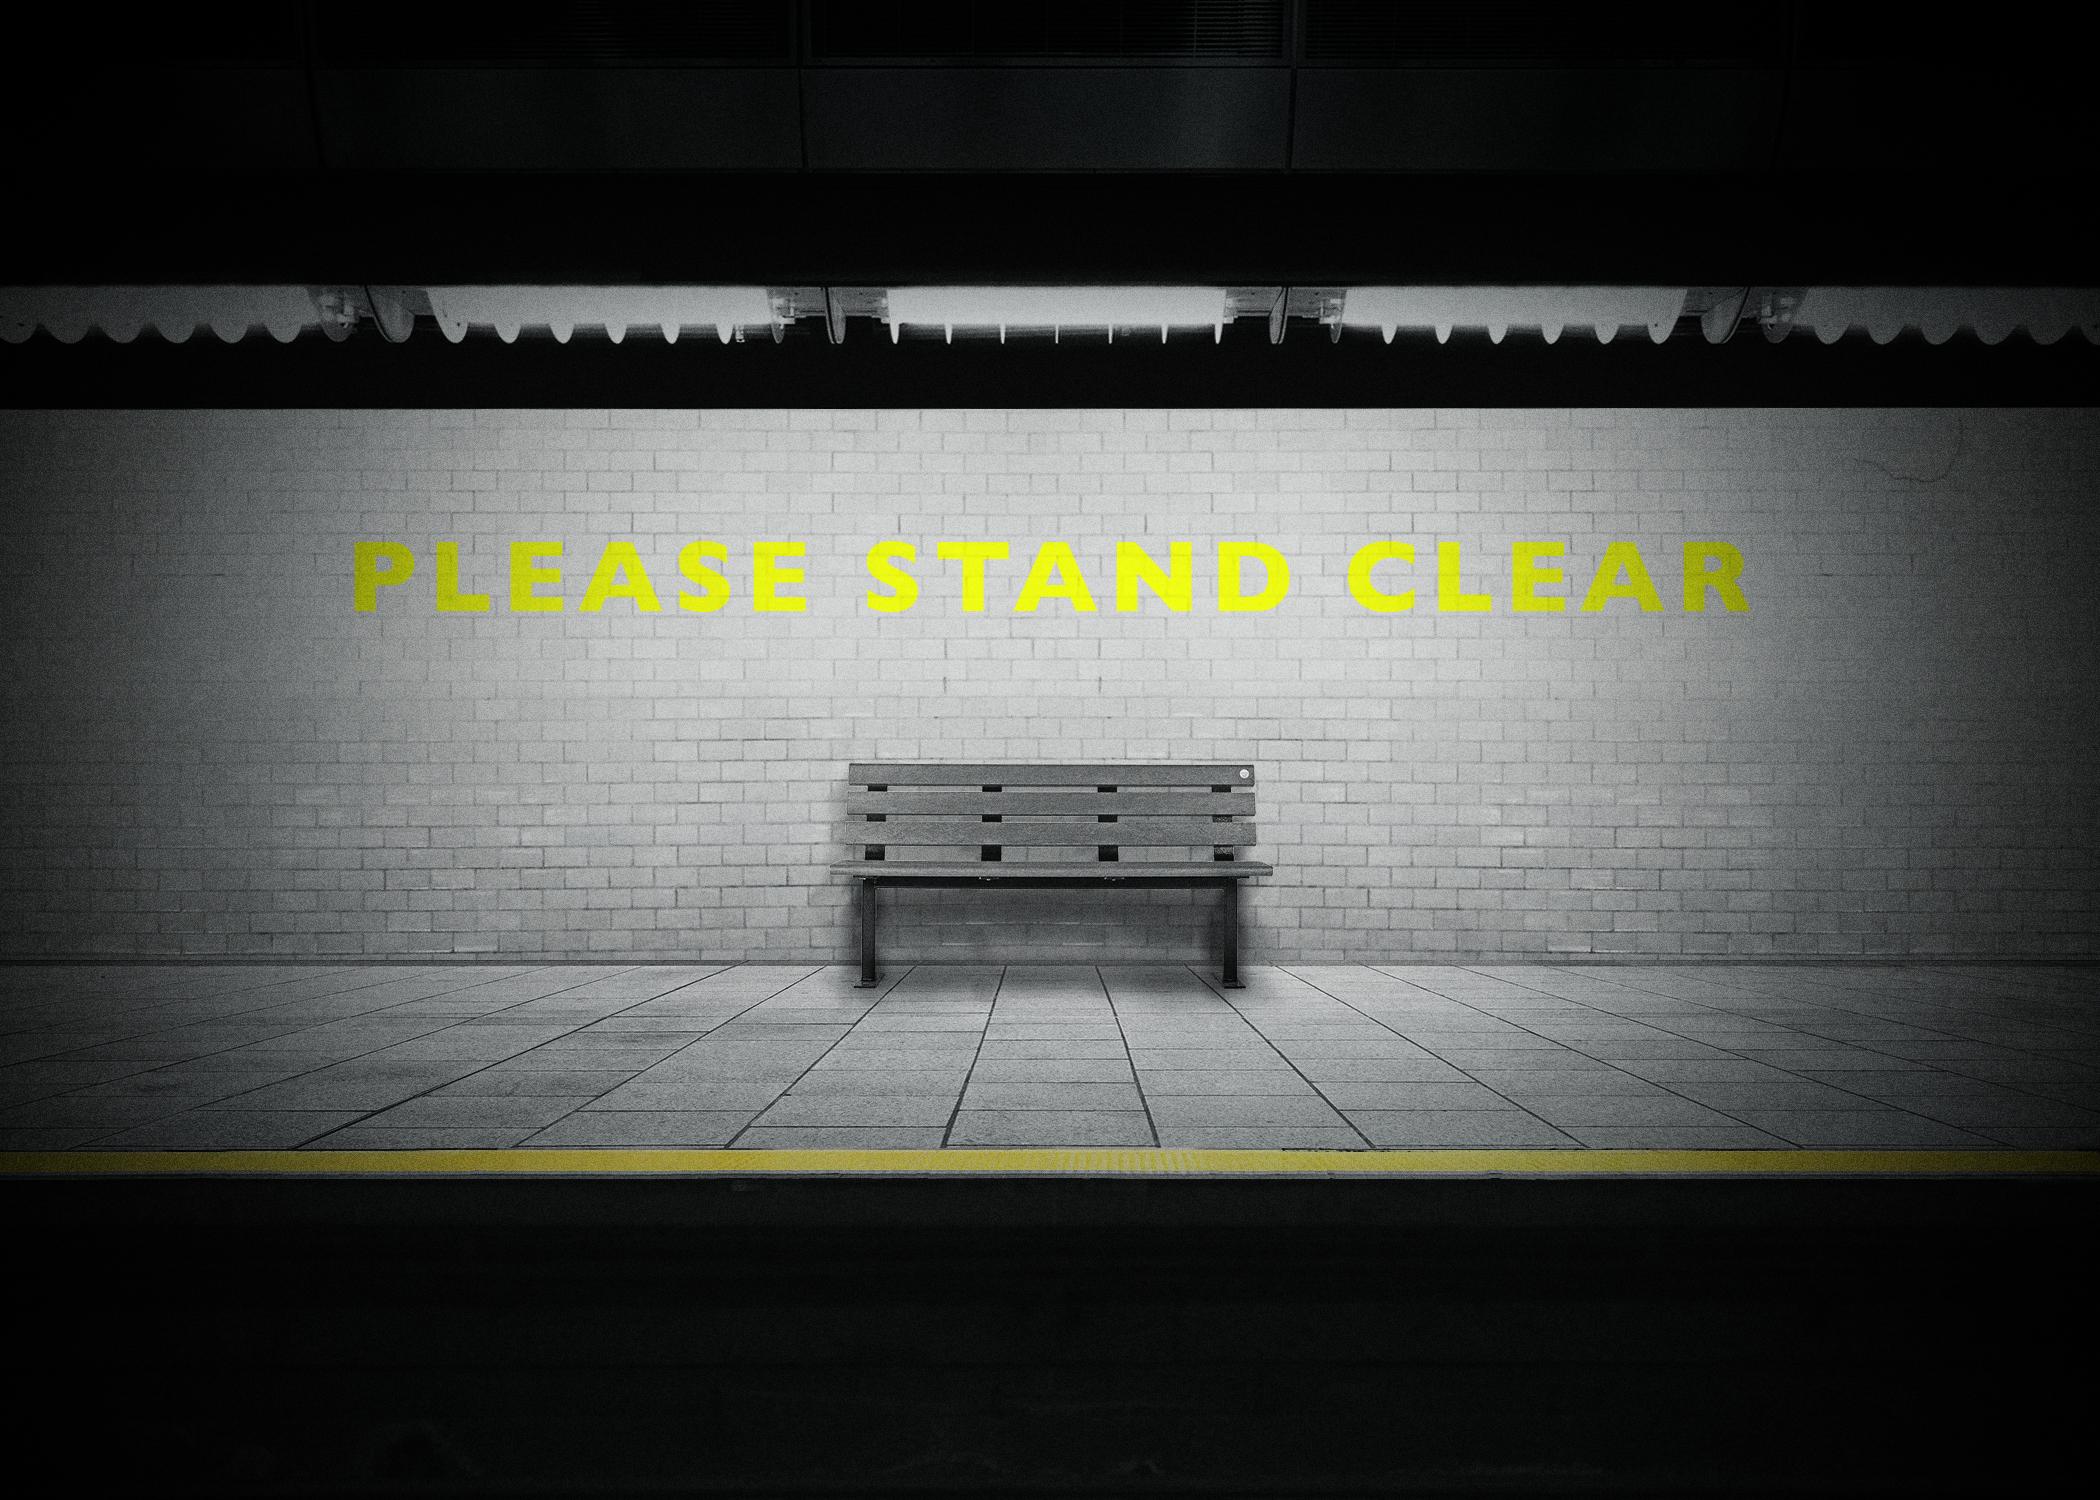 pleaseStandClear.jpg